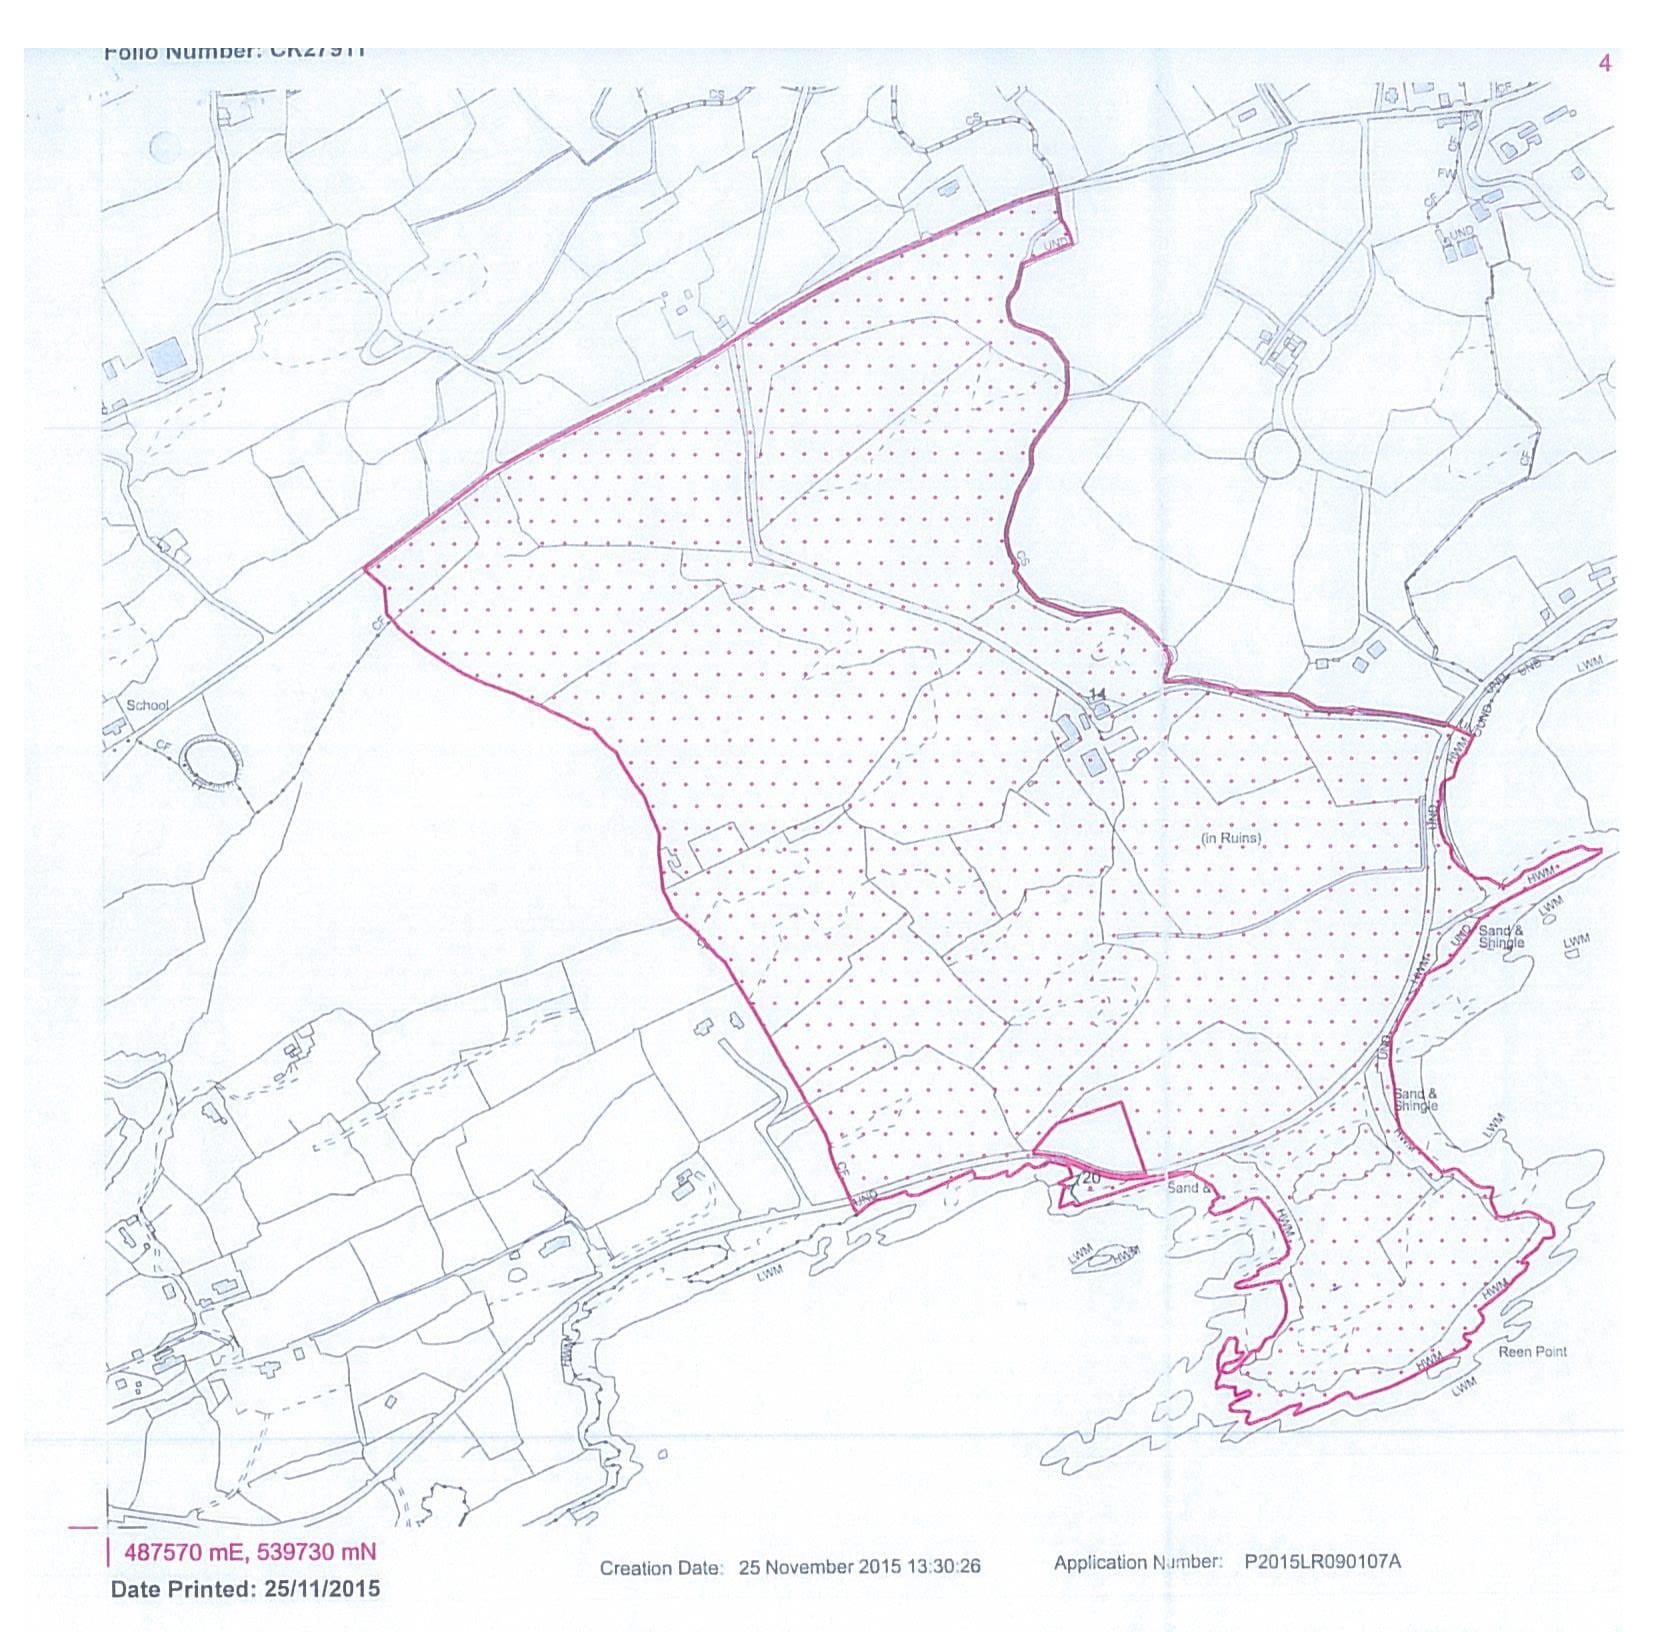 DOC001.jpg Map